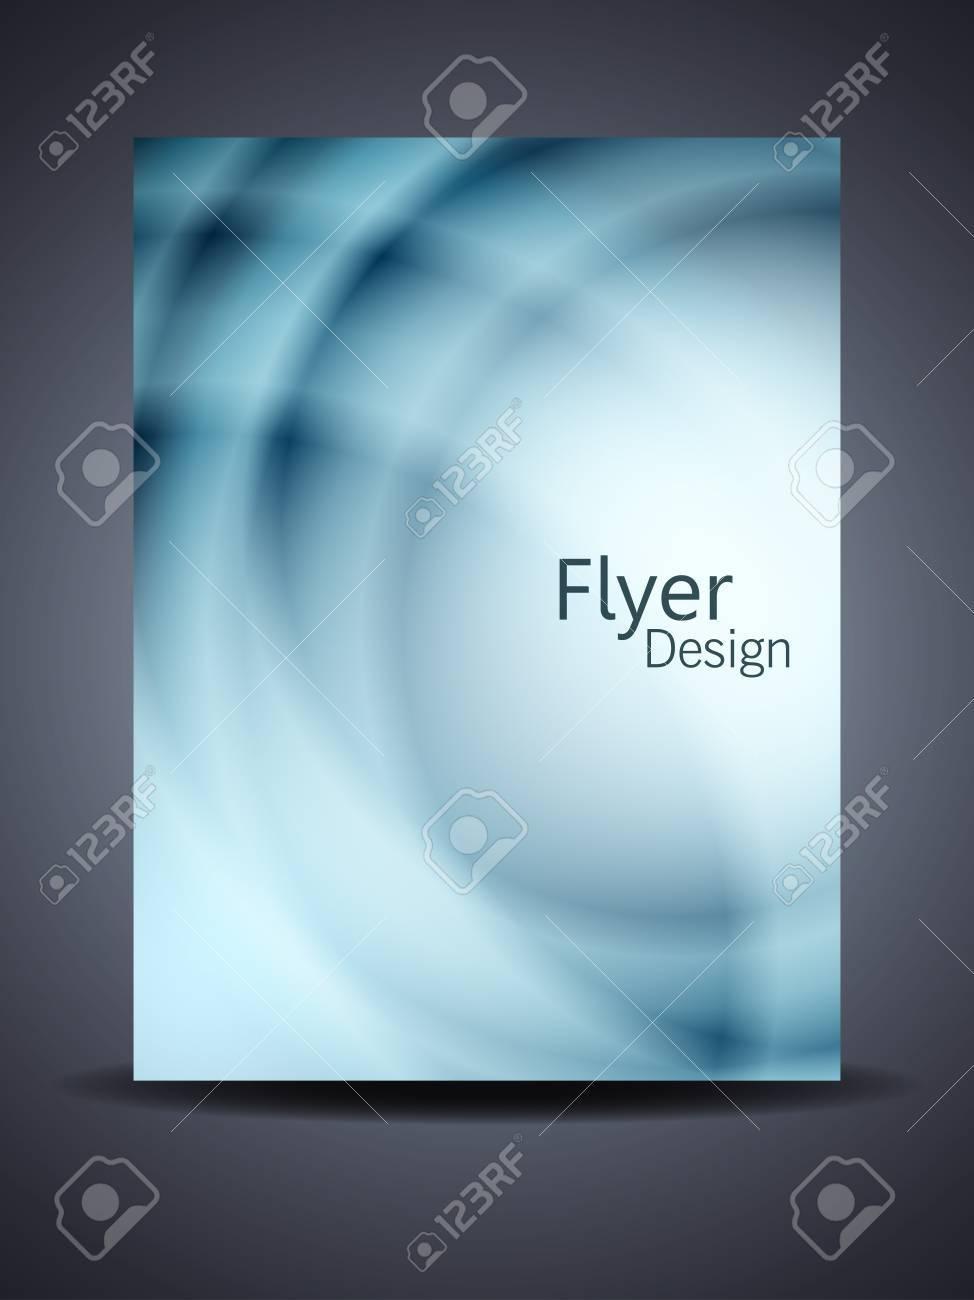 Presentation of creative flyer or cover design. Stock Vector - 18303240